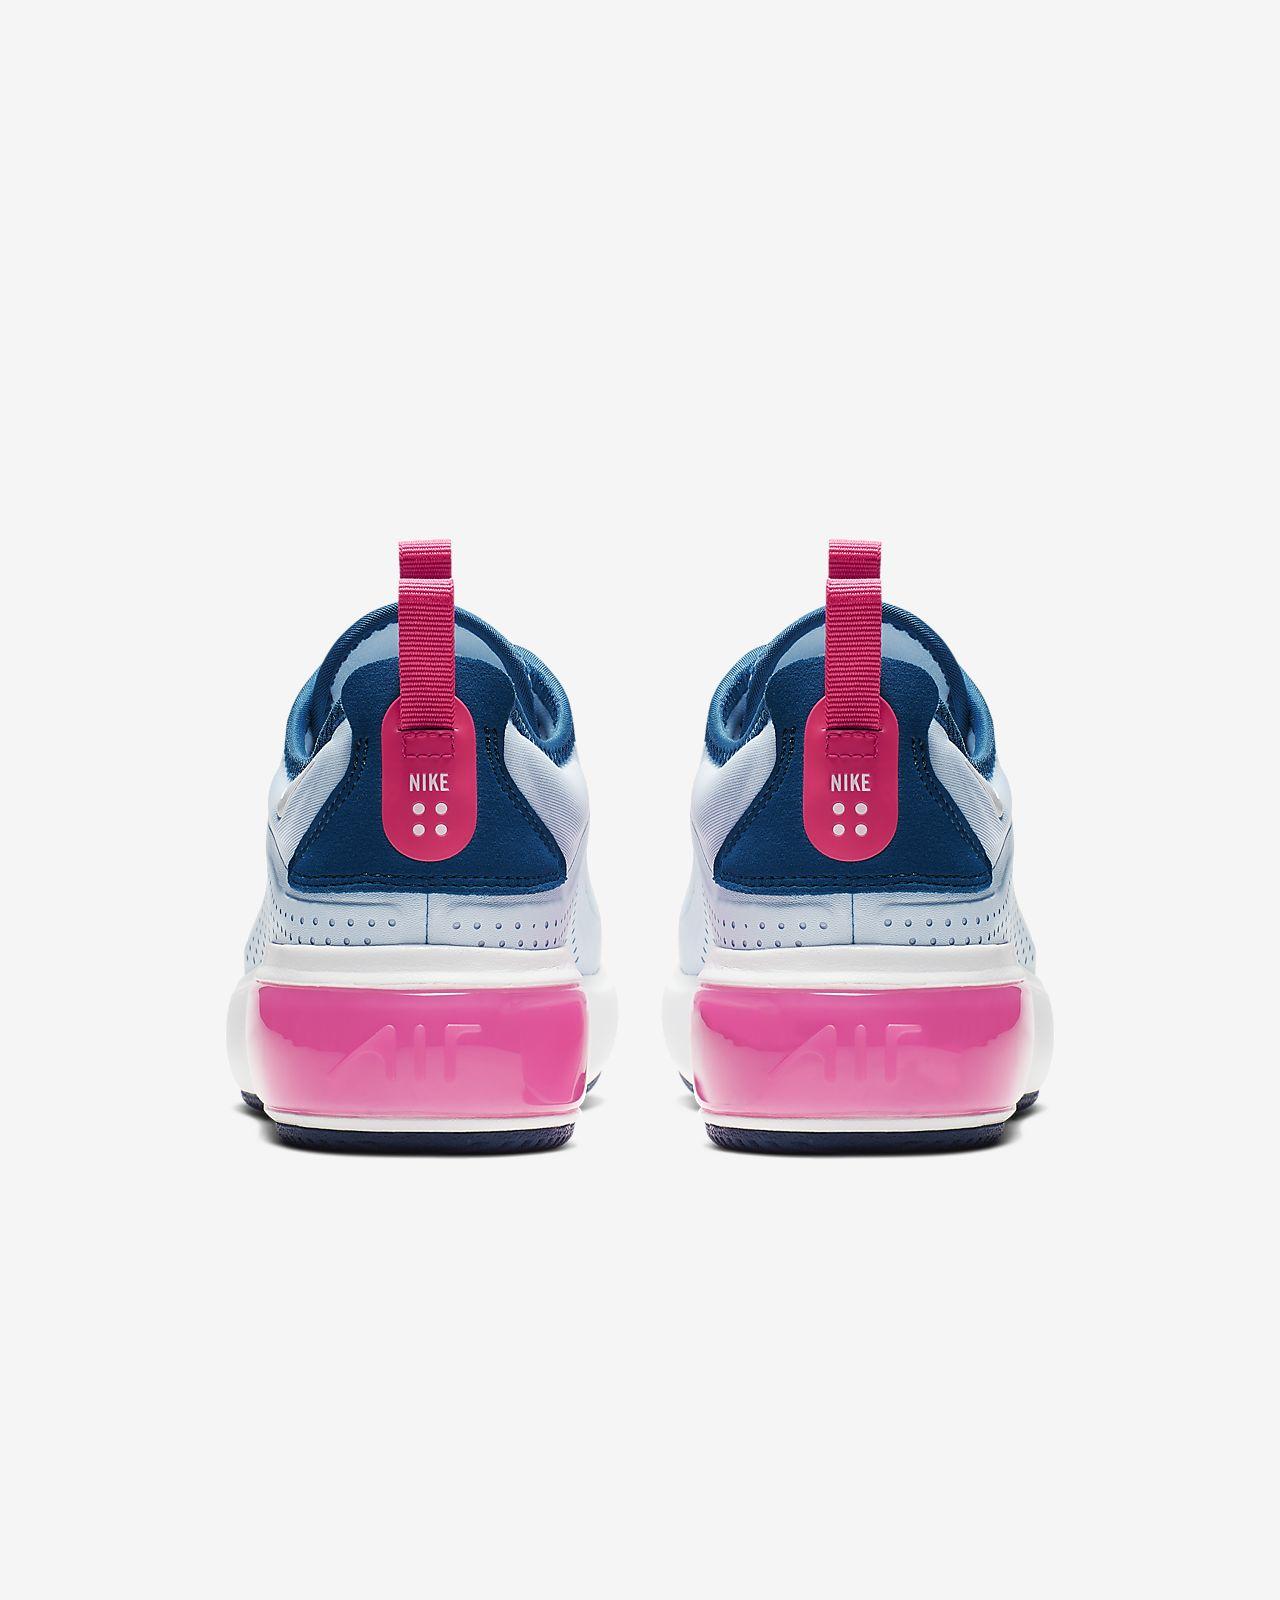 wholesale dealer 0e75d b4aff ... Nike Air Max Dia sko